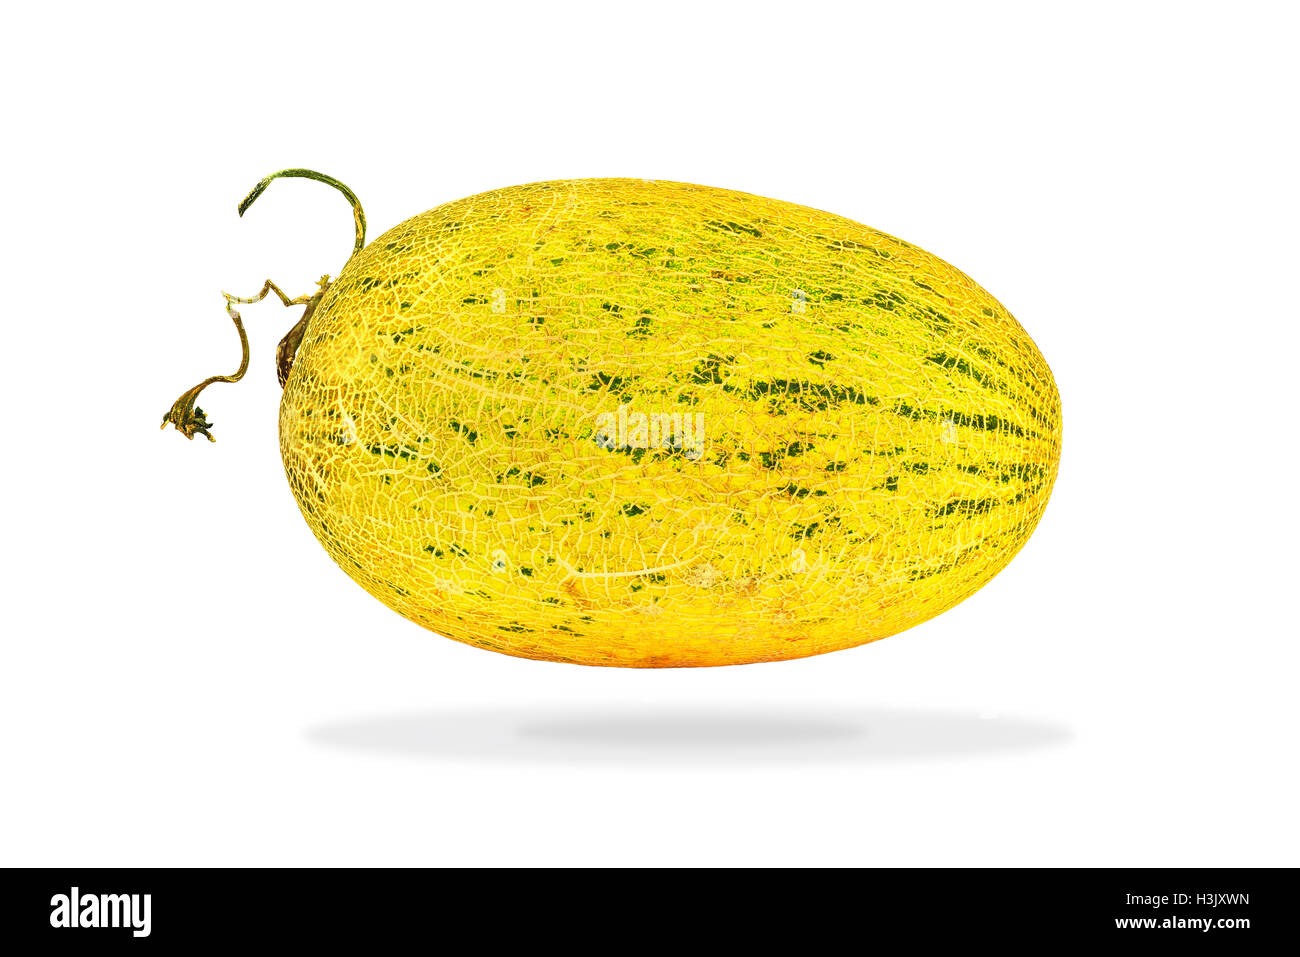 Tibet melon on white background - Stock Image